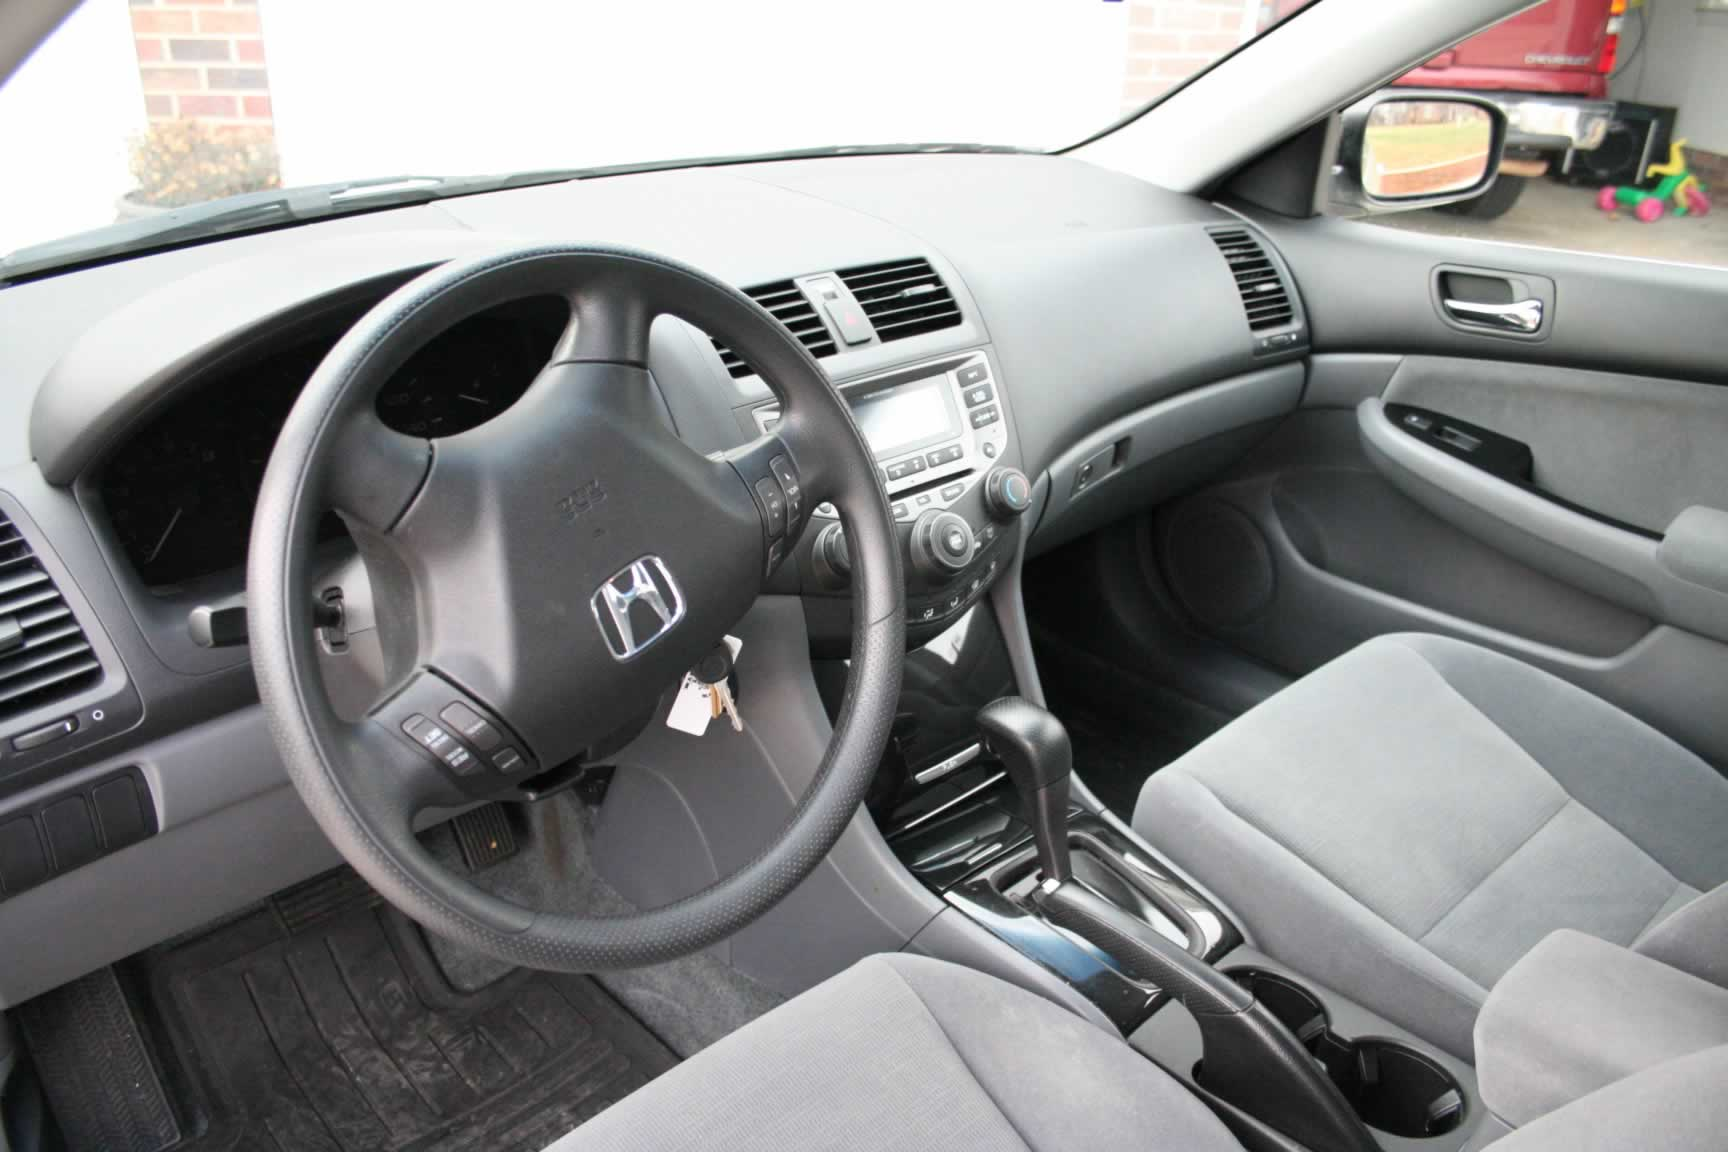 Charming 2006 Honda Accord SE/Inside.JPG